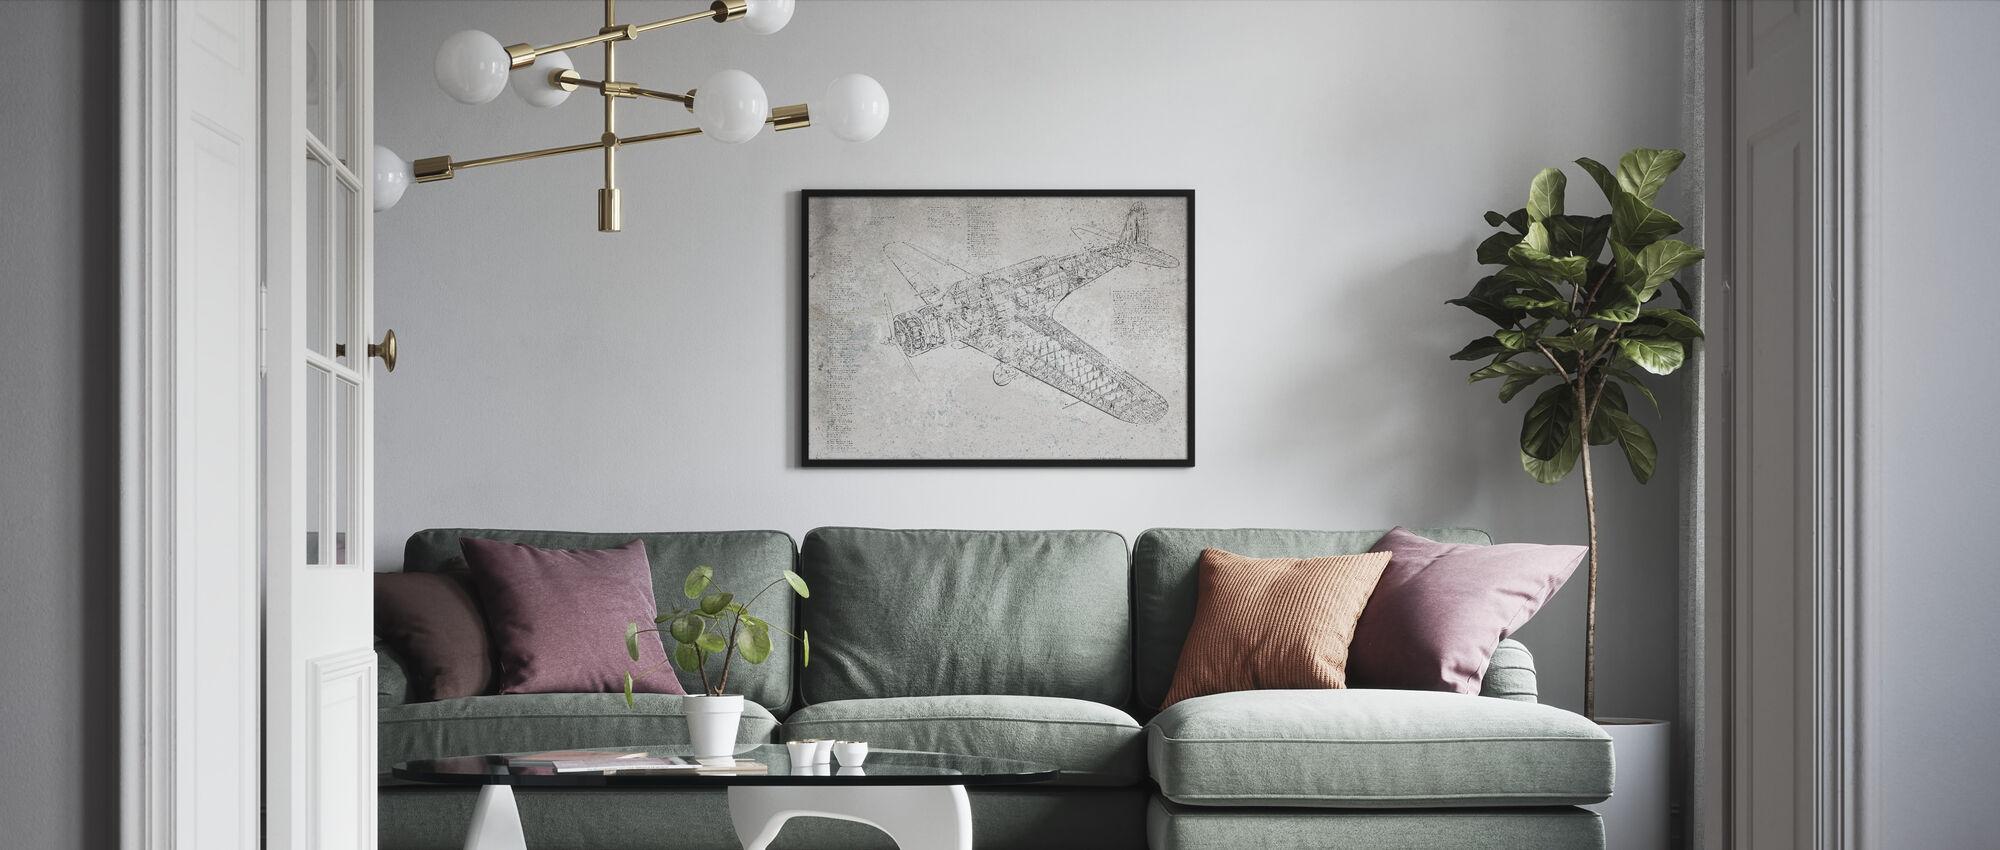 Retro Airplane - Framed print - Living Room